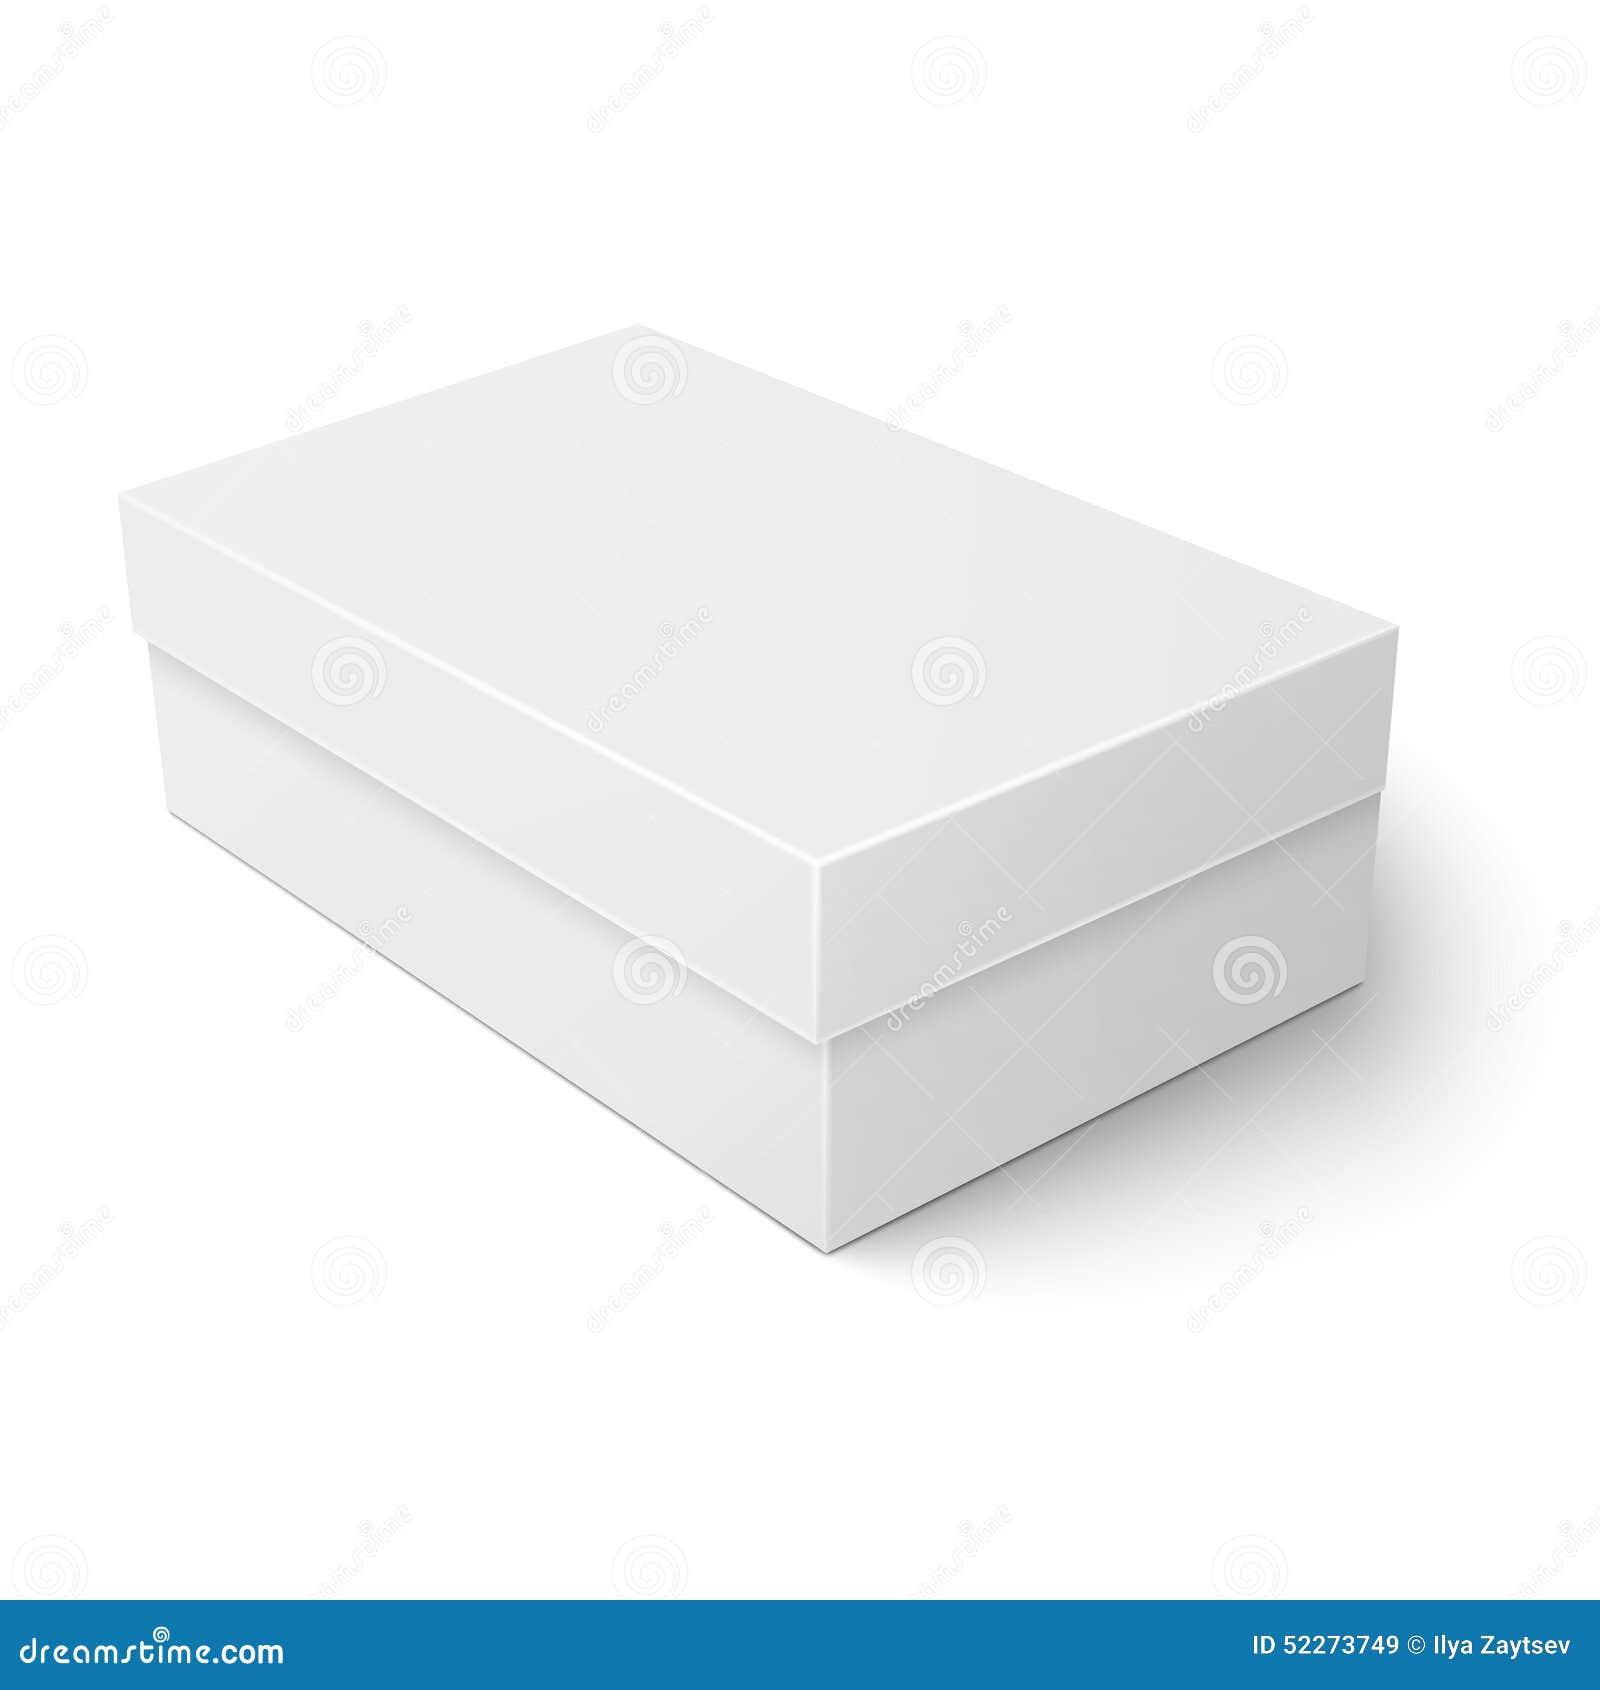 white cardboard shoebox template stock vector image 52273749. Black Bedroom Furniture Sets. Home Design Ideas